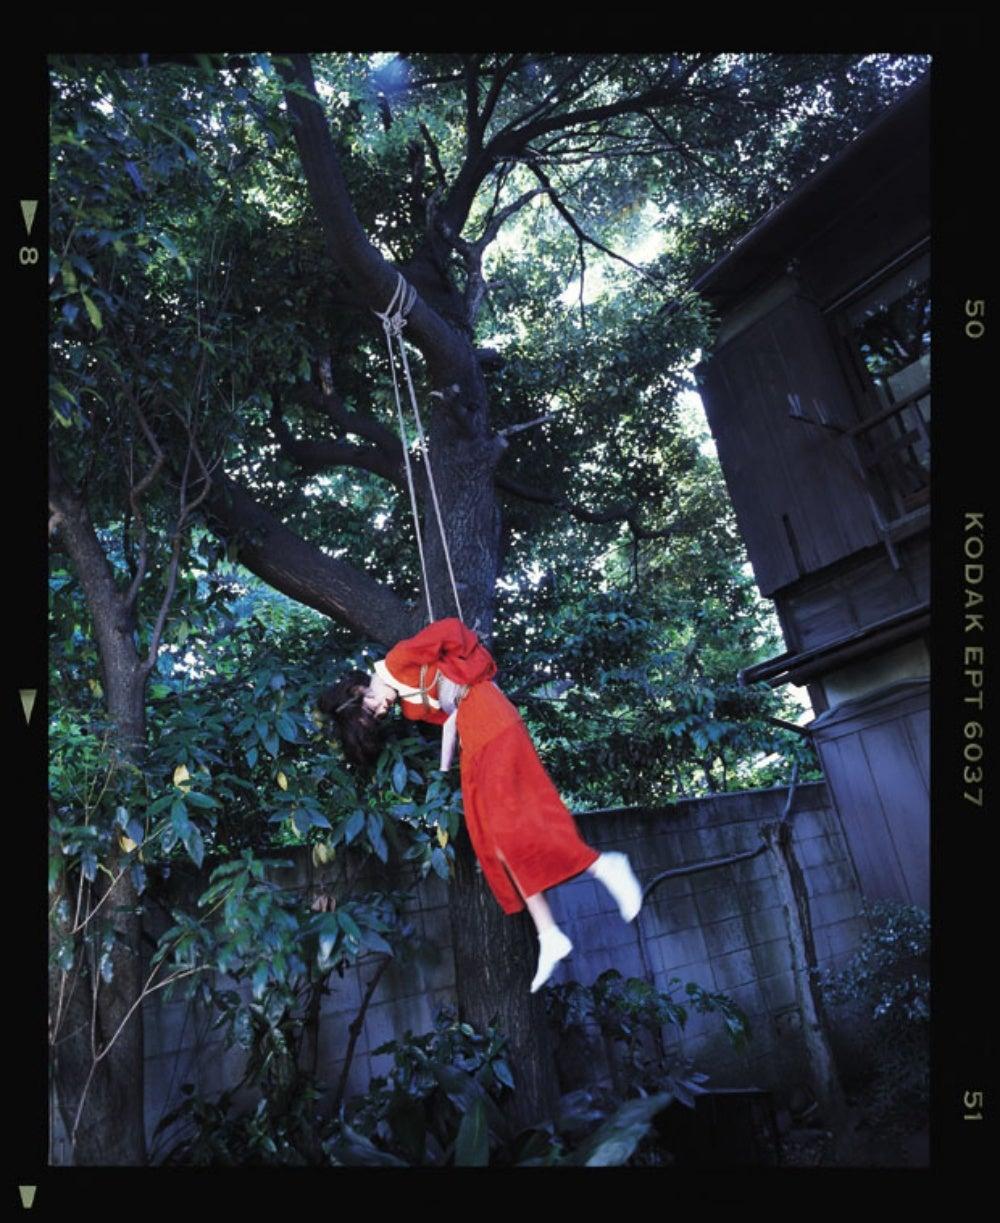 67 Shooting Back #GDN160 – Nobuyoshi Araki, Woman, Bondage, Japan, Photography